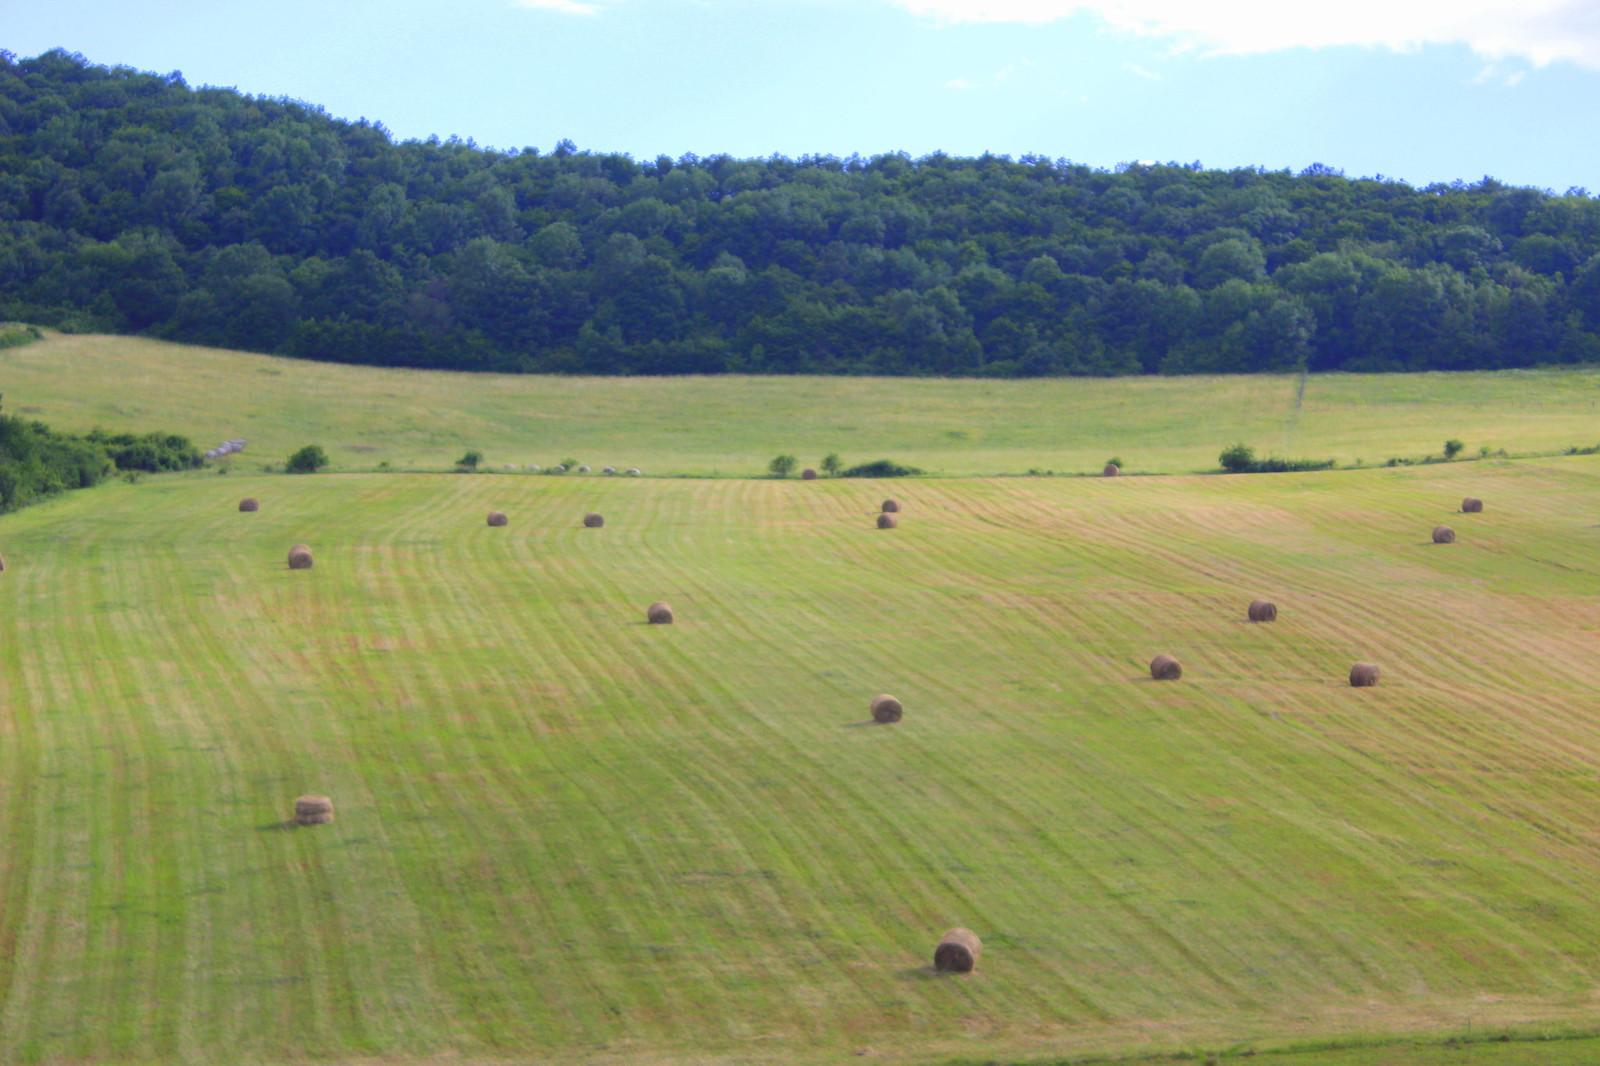 budapest meadow